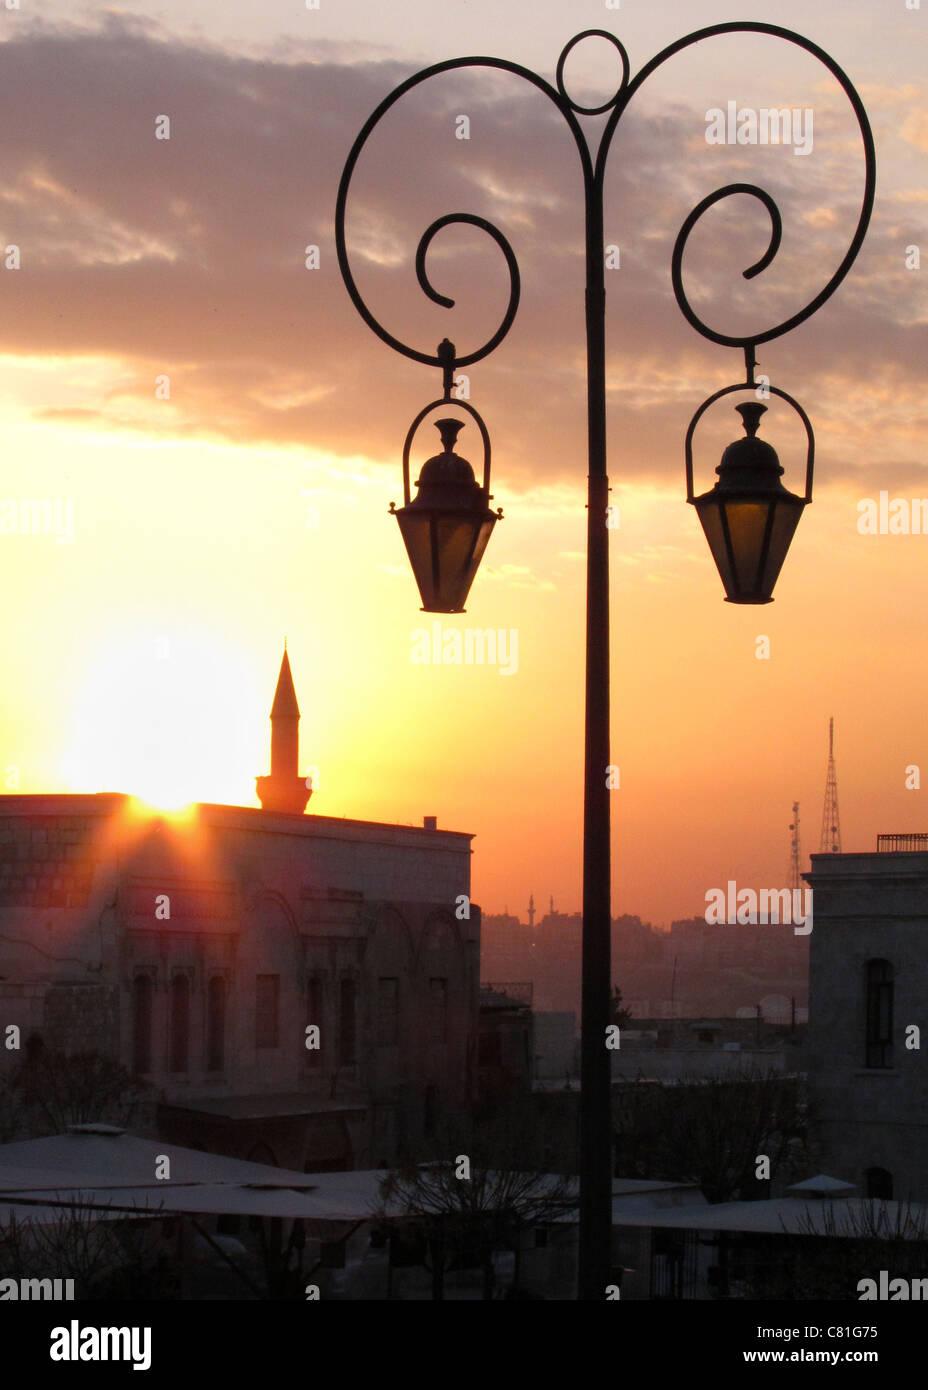 Aleppo, Syria, Syrien oldtown Altstadt Sonnenuntergang sunset - Stock Image